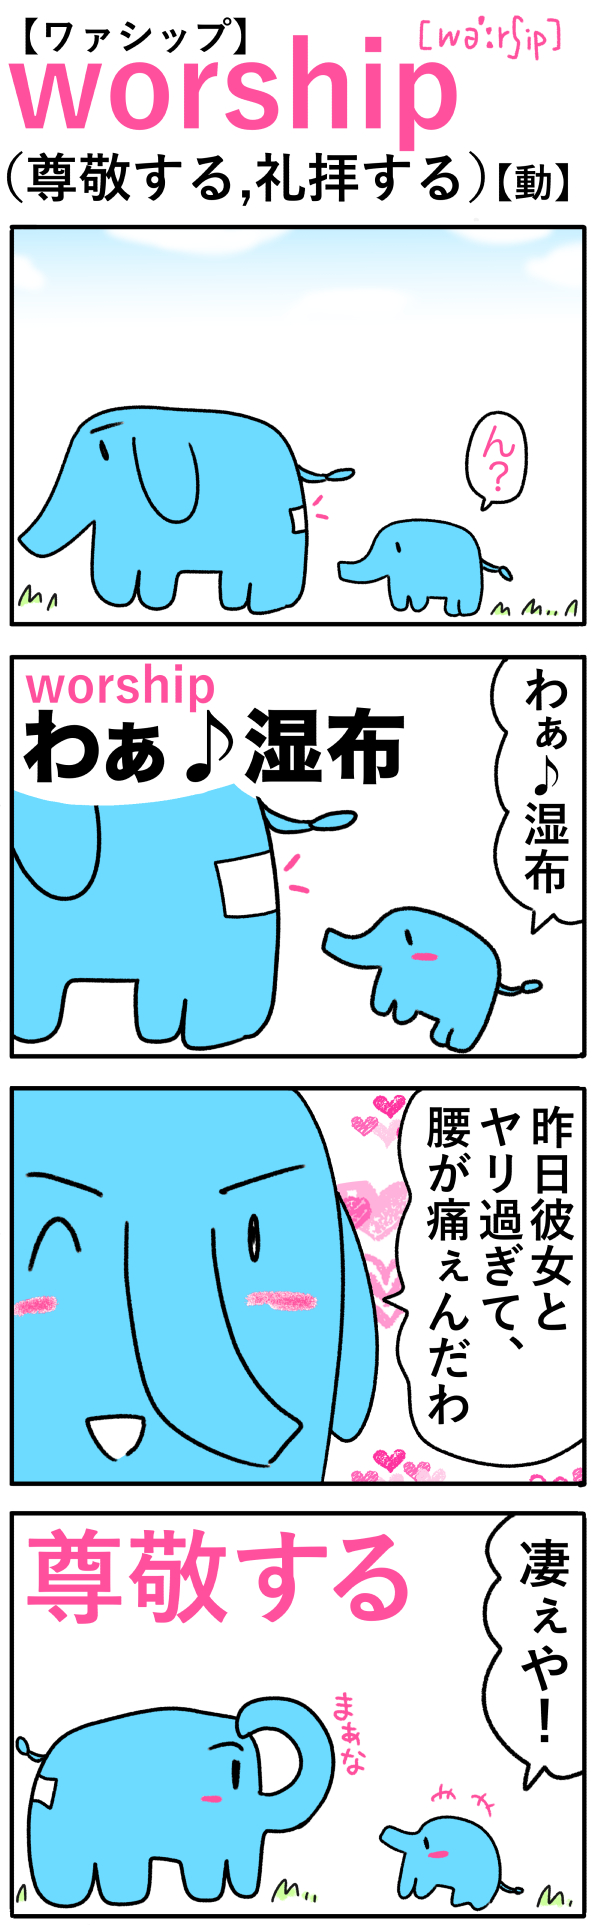 worship(尊敬する、礼拝する)の語呂合わせ英単語